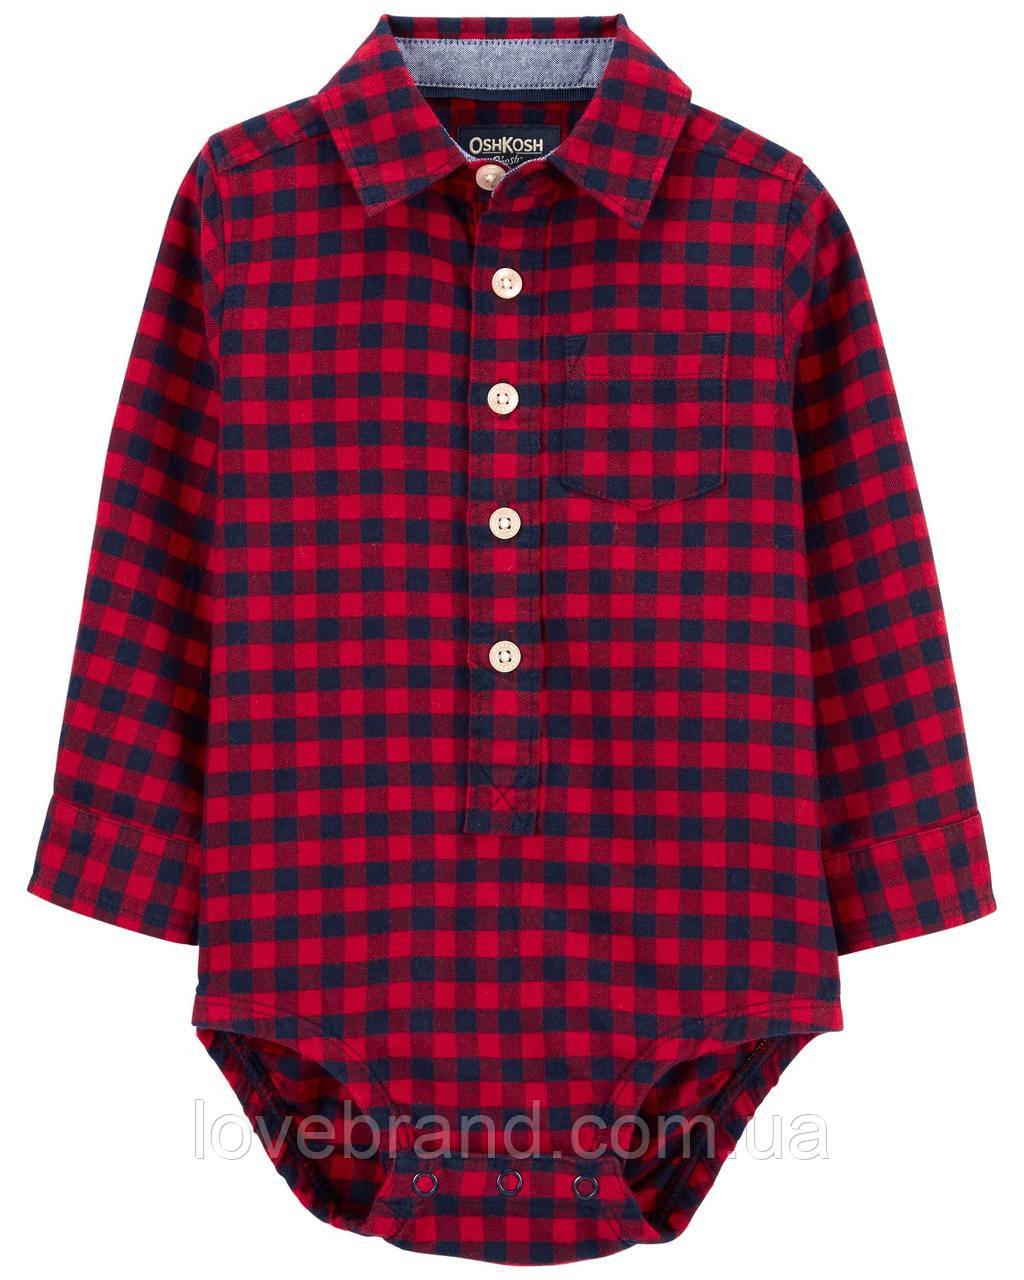 Фланелевая рубашка-боди для мальчика OshKosh (США) красная клетка